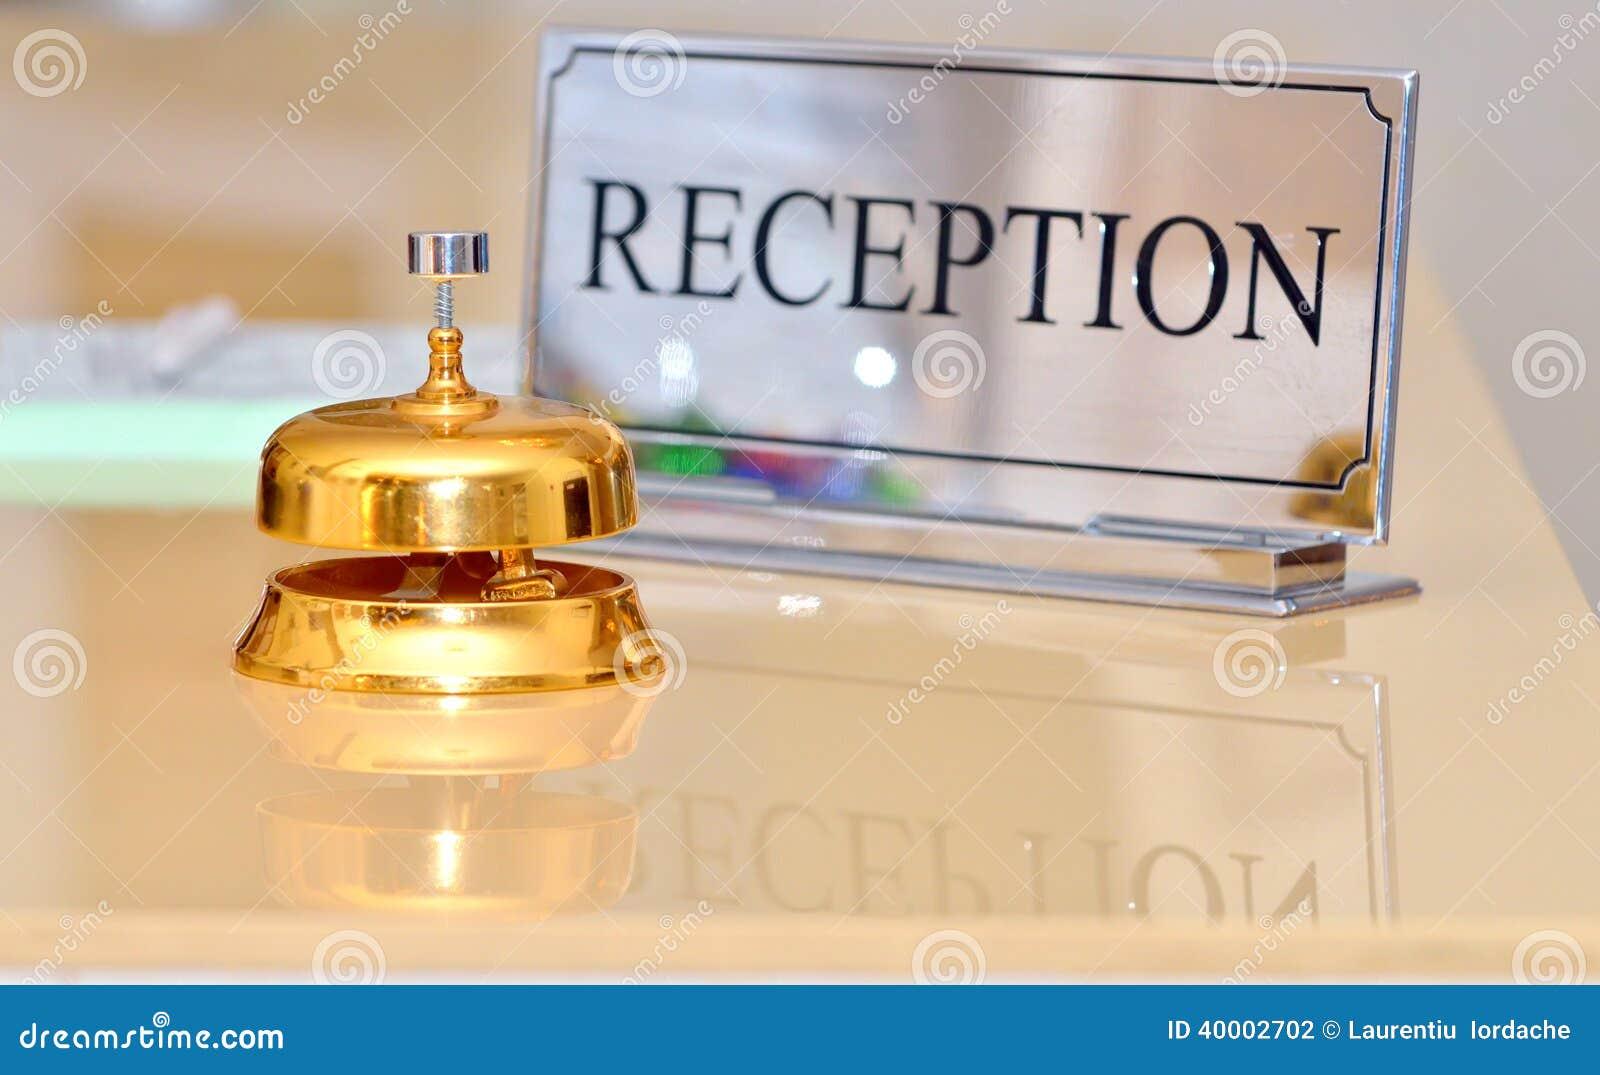 Hotelglocke